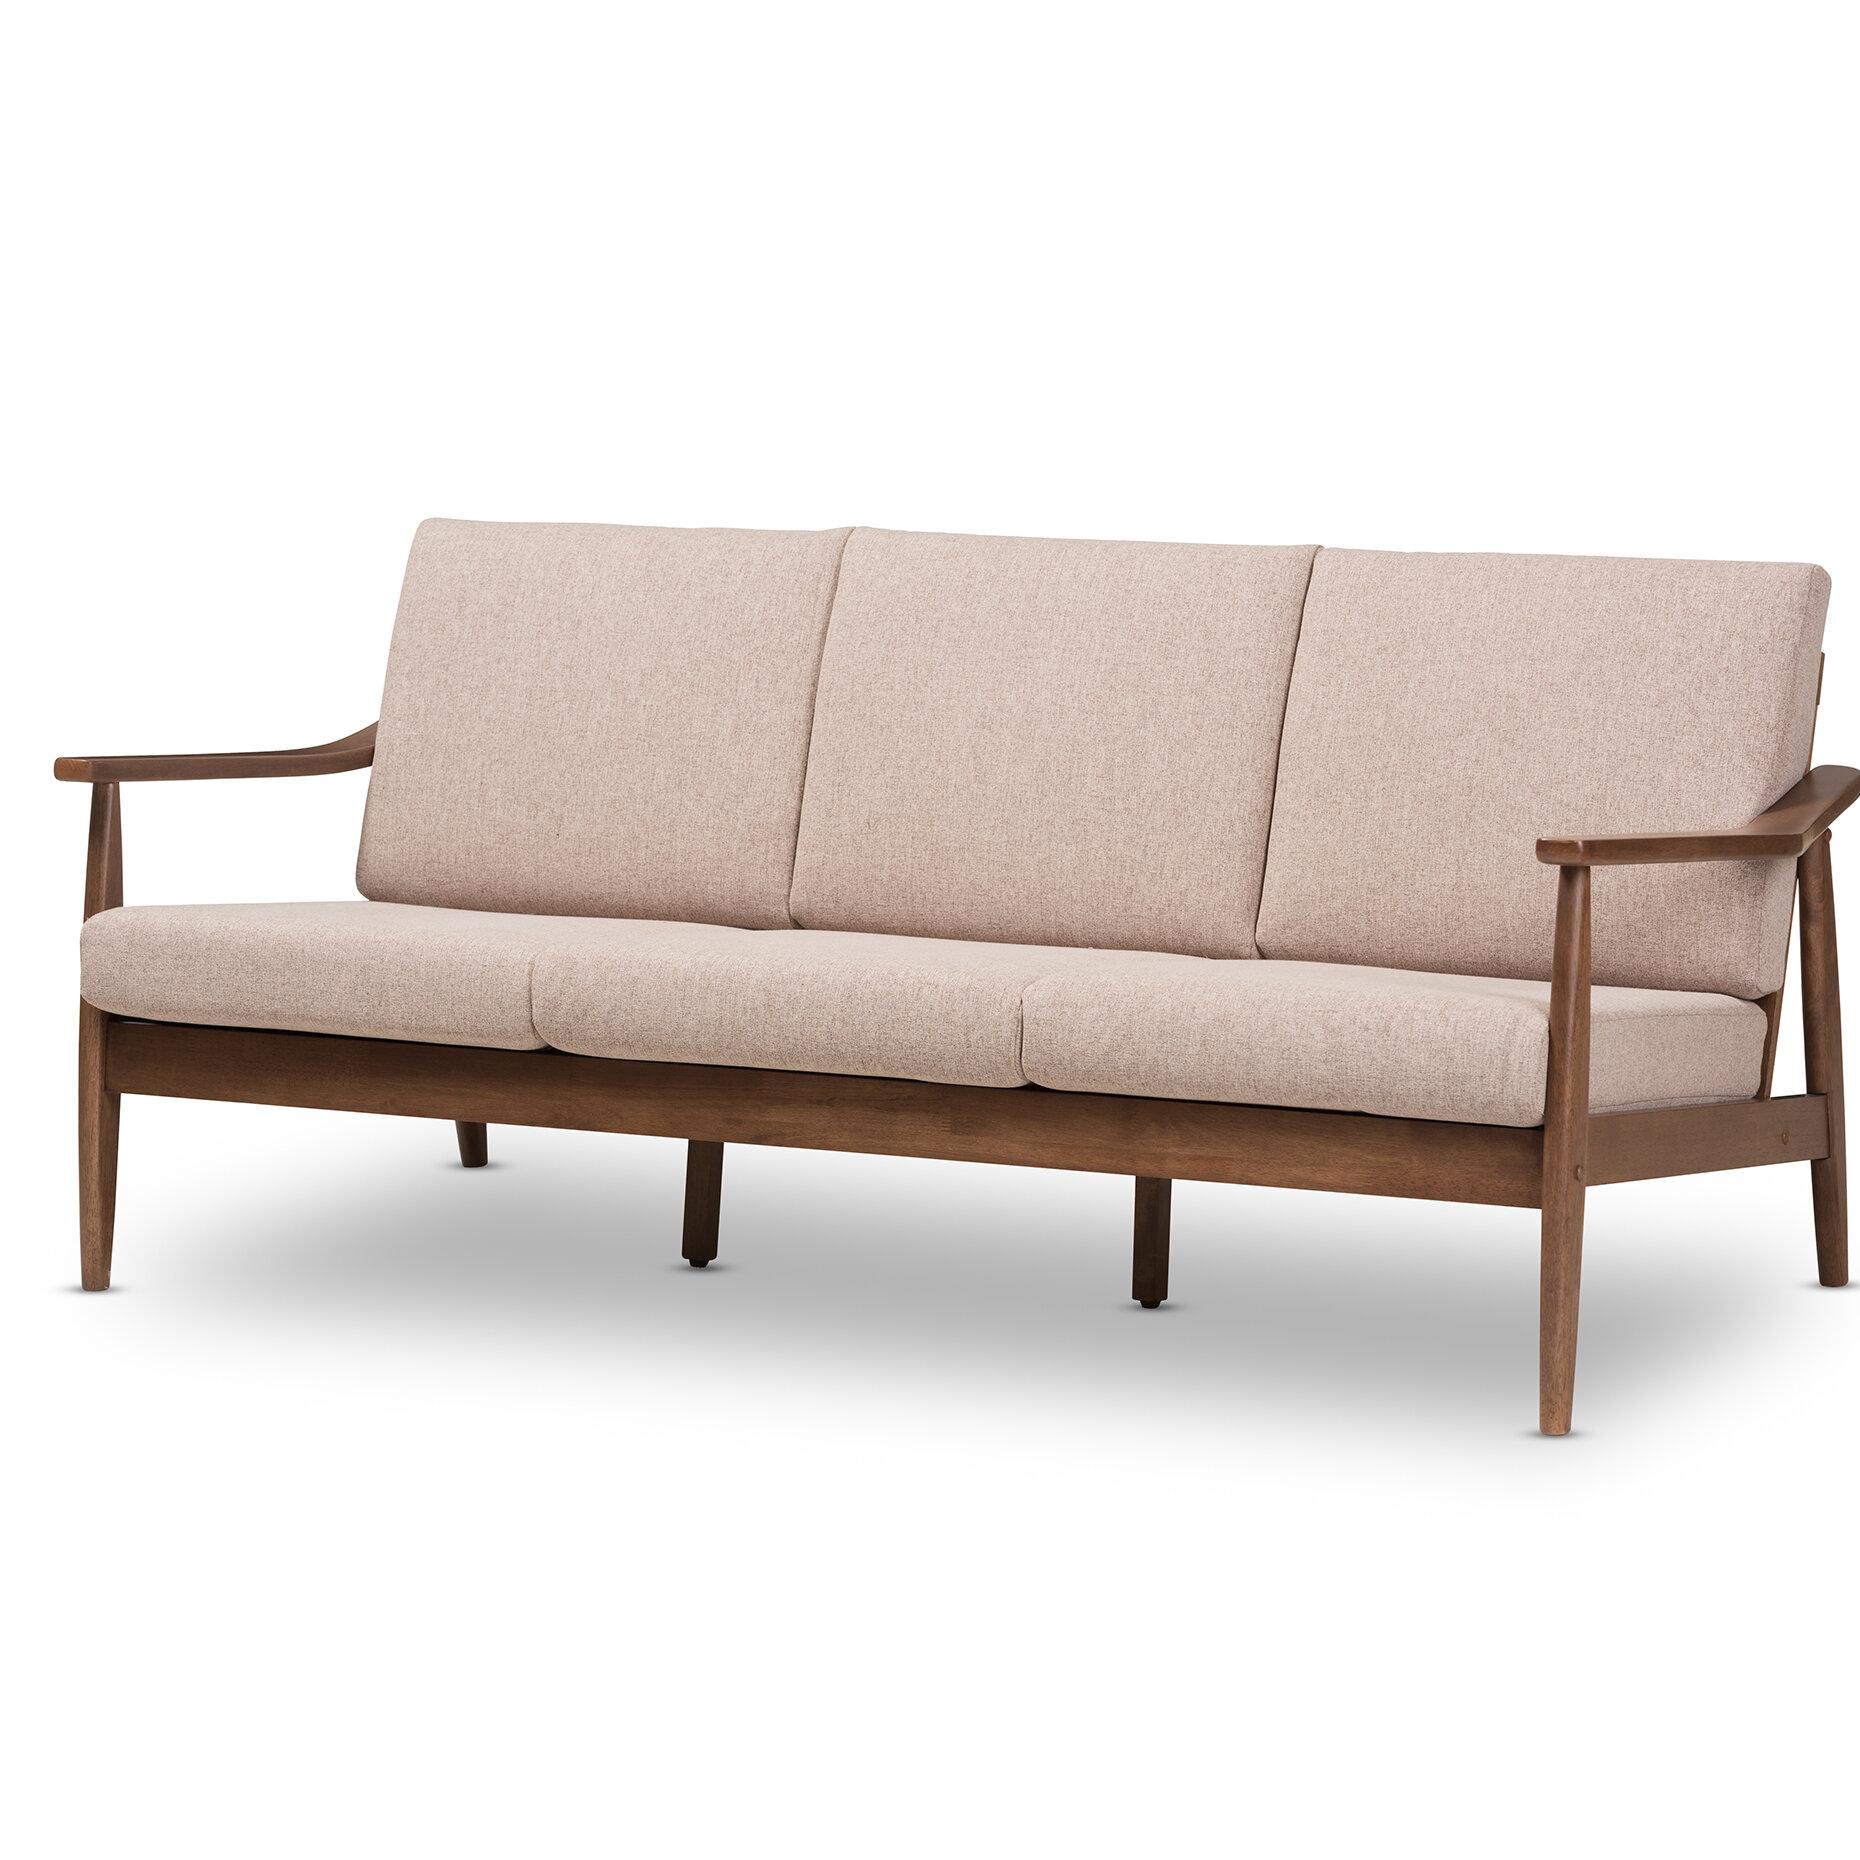 Merveilleux Union Rustic Kellner Mid Century Modern Sofa U0026 Reviews | Wayfair